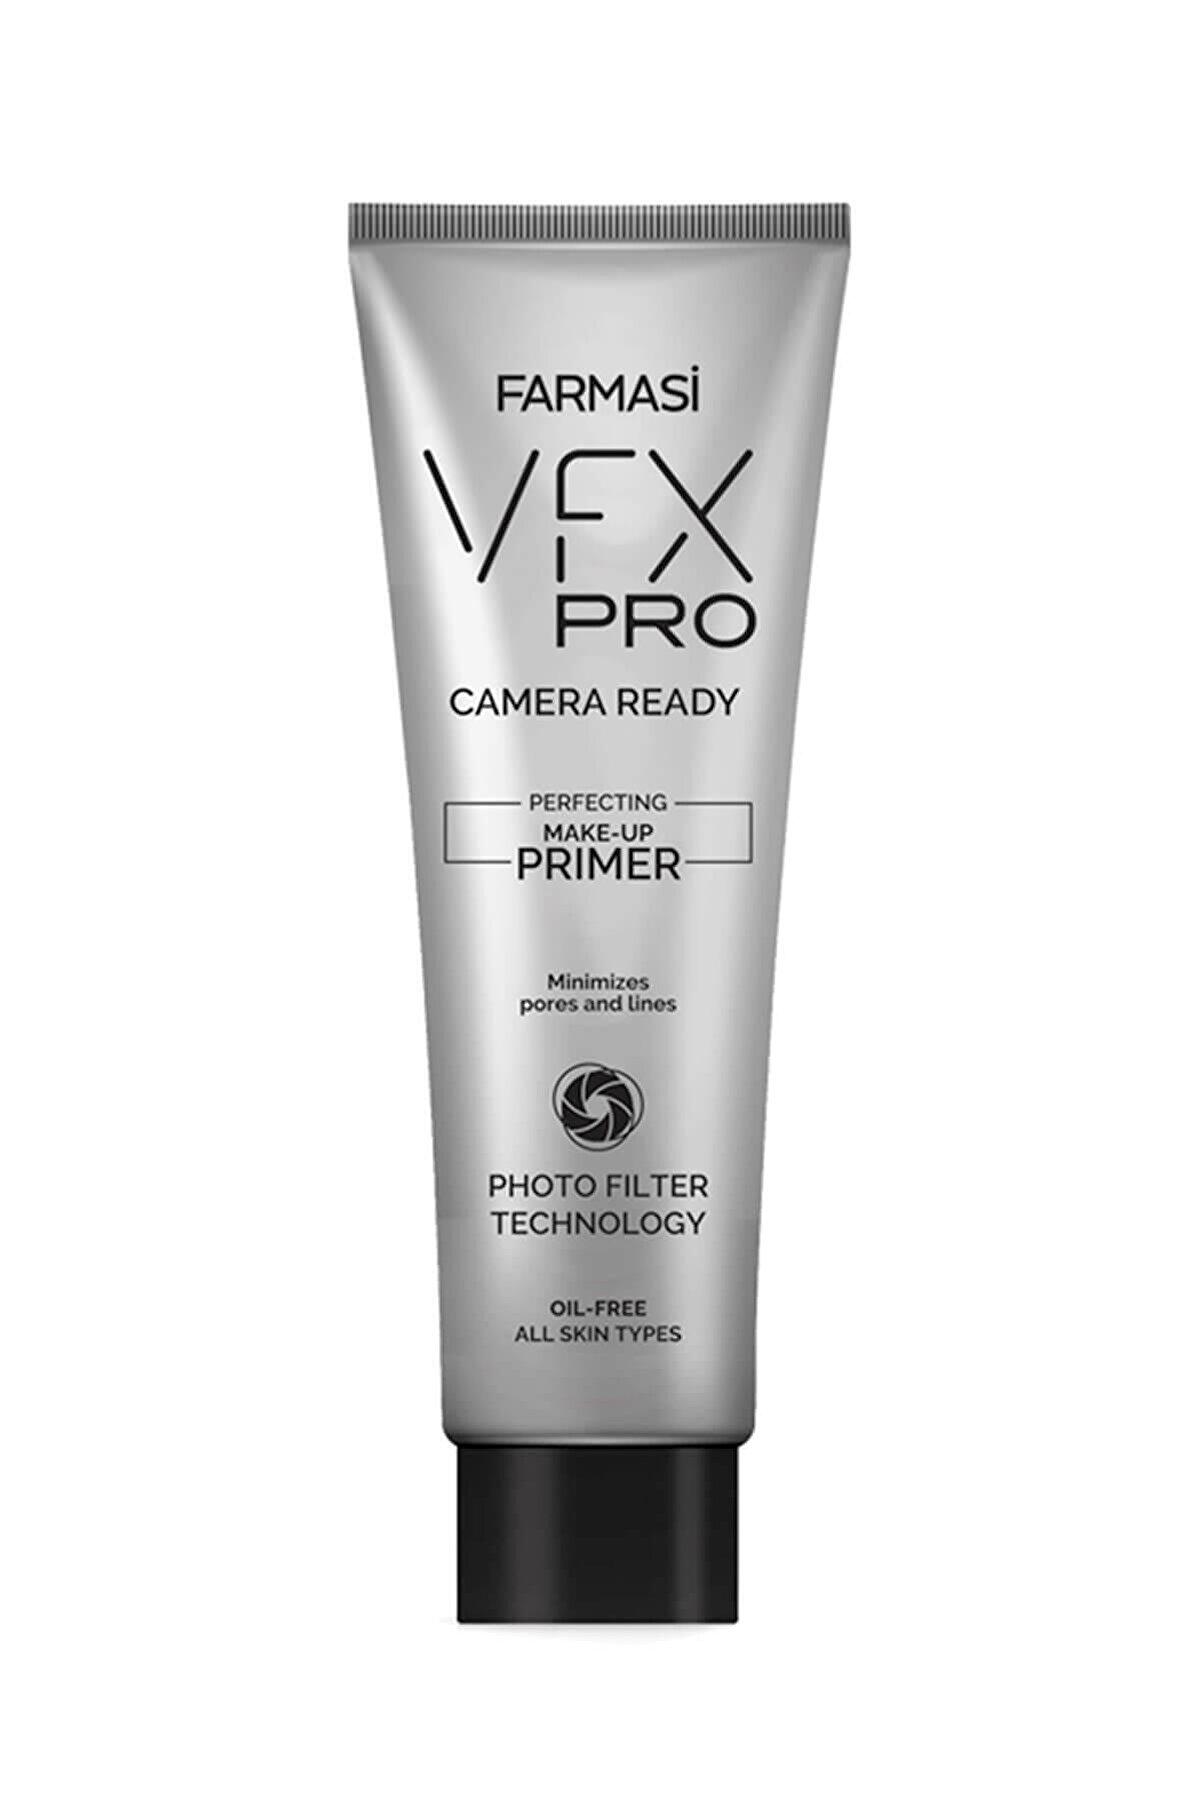 Farmasi Vfx Pro Camera Ready Makyaj Bazı 25 Ml.